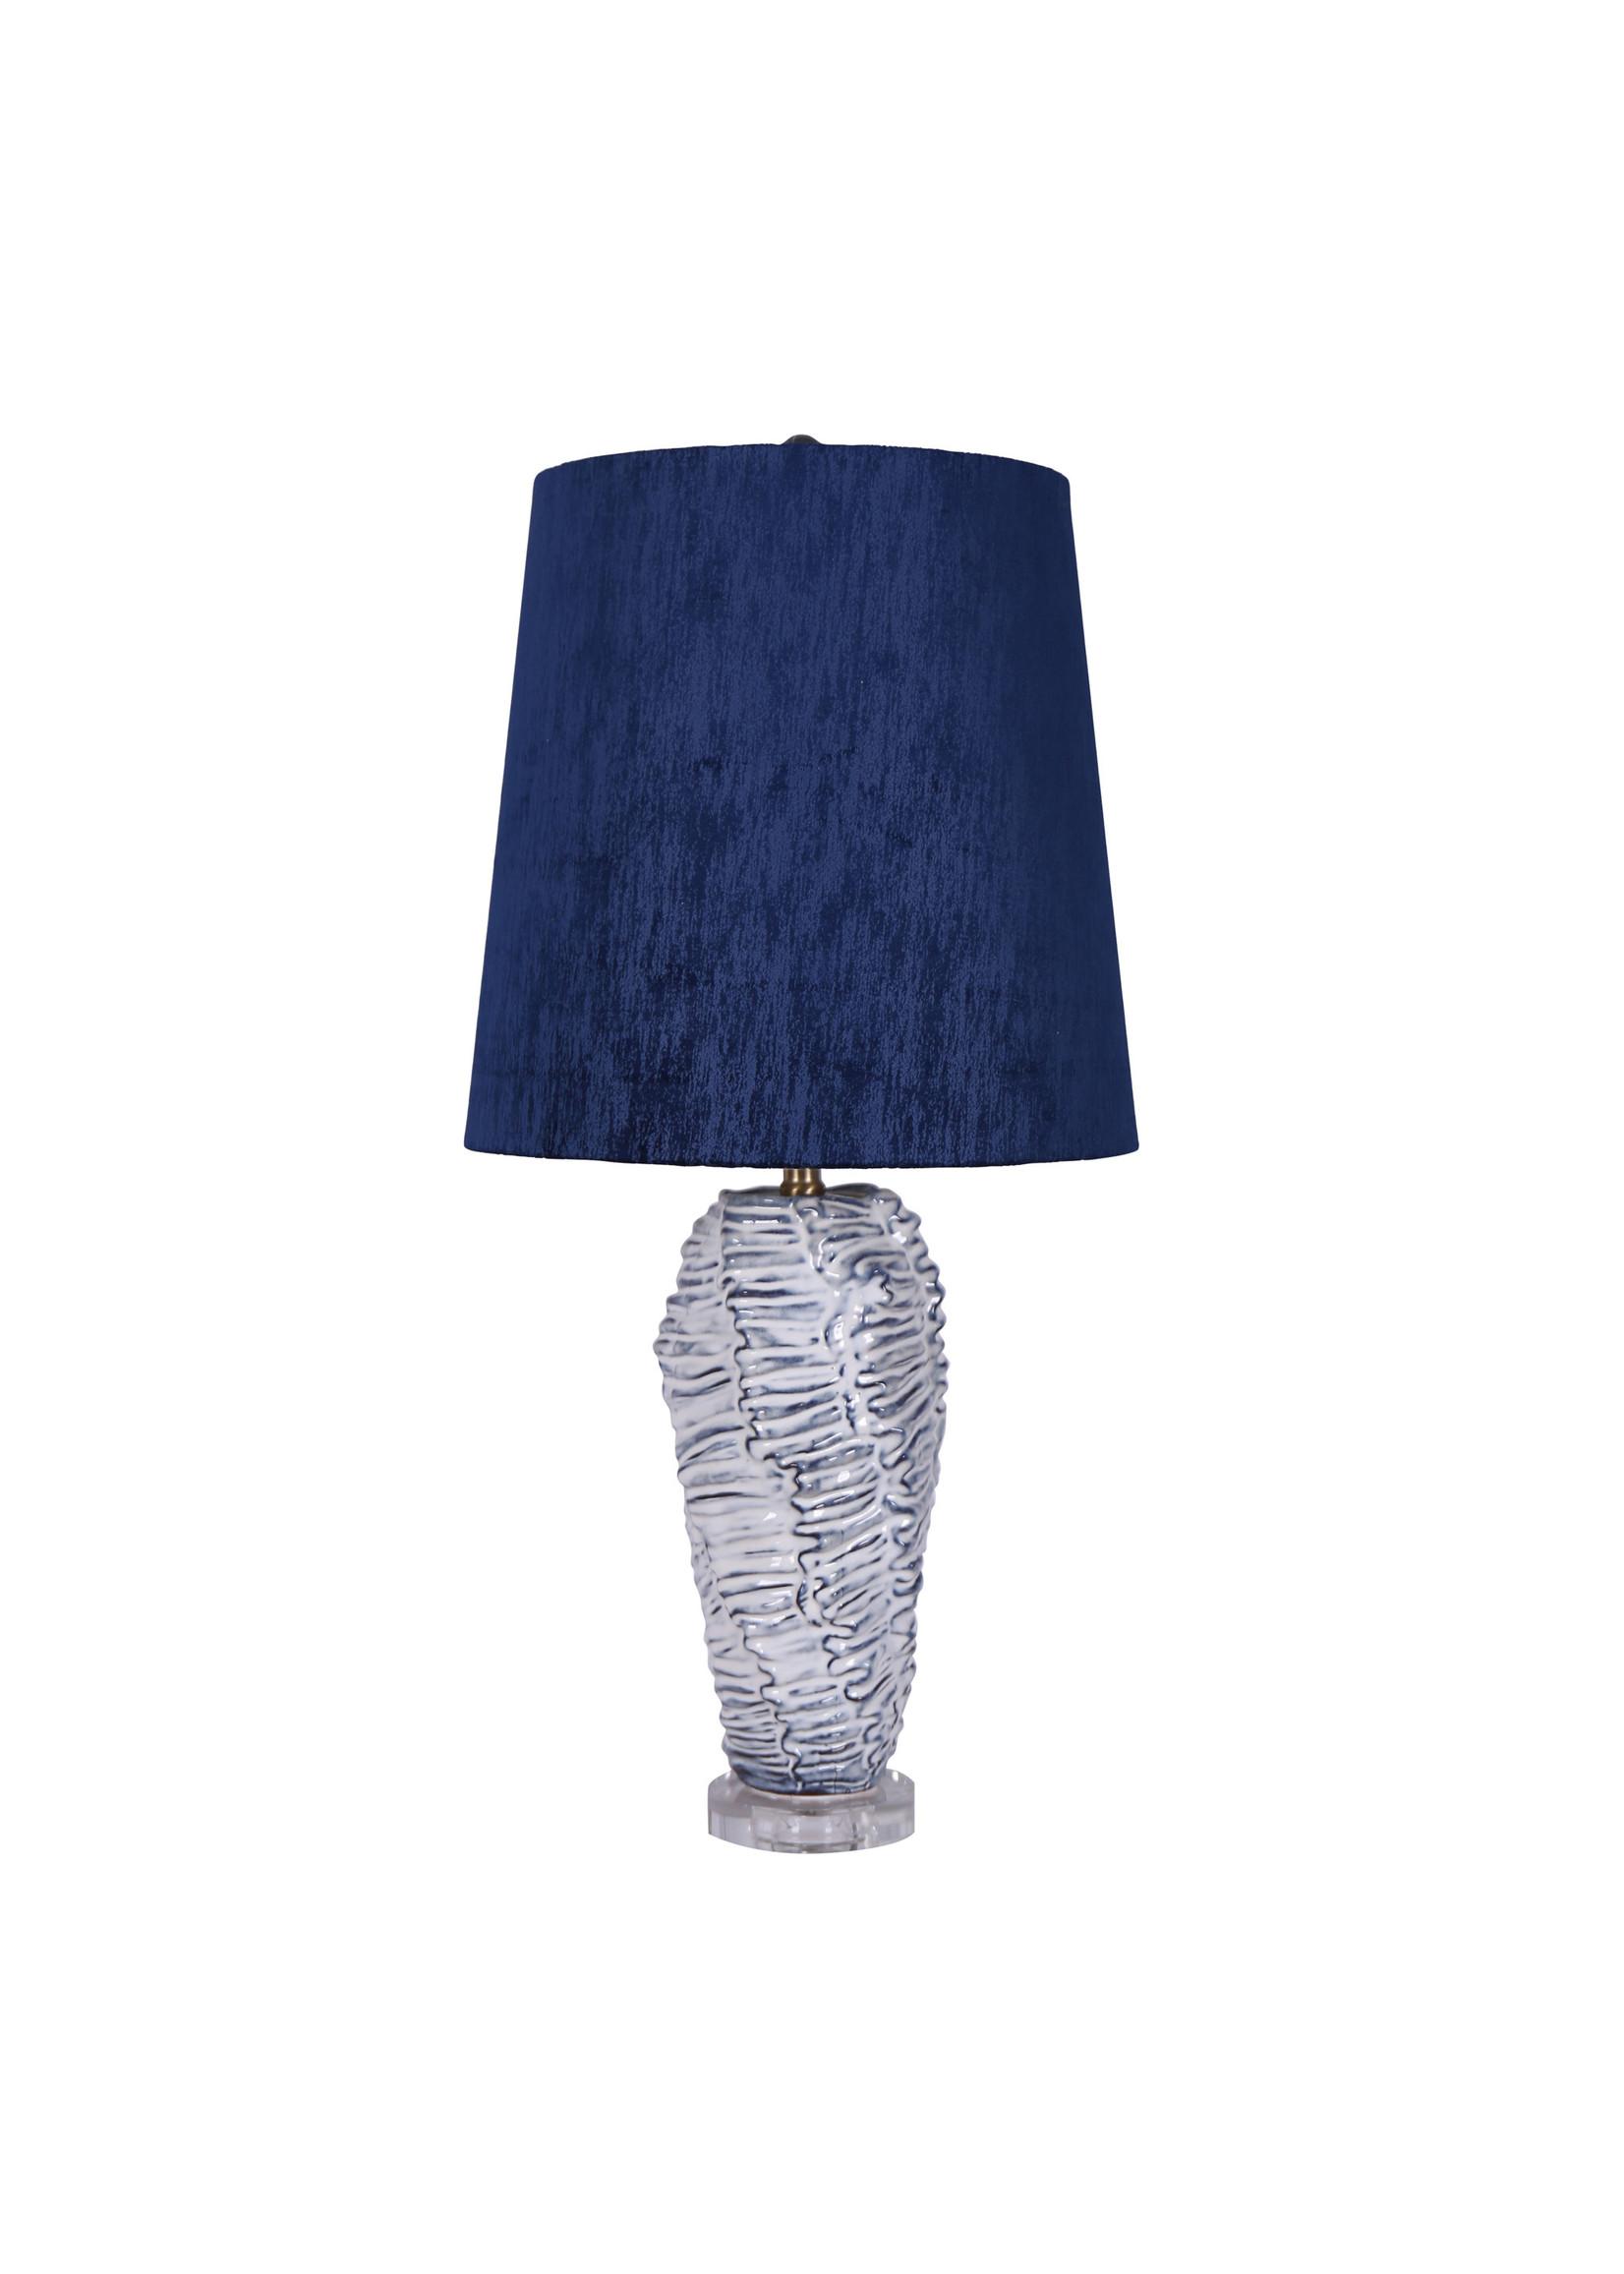 "Sagebrook Home SBH 32.5"" Ceramic Table Lamp White Wash"